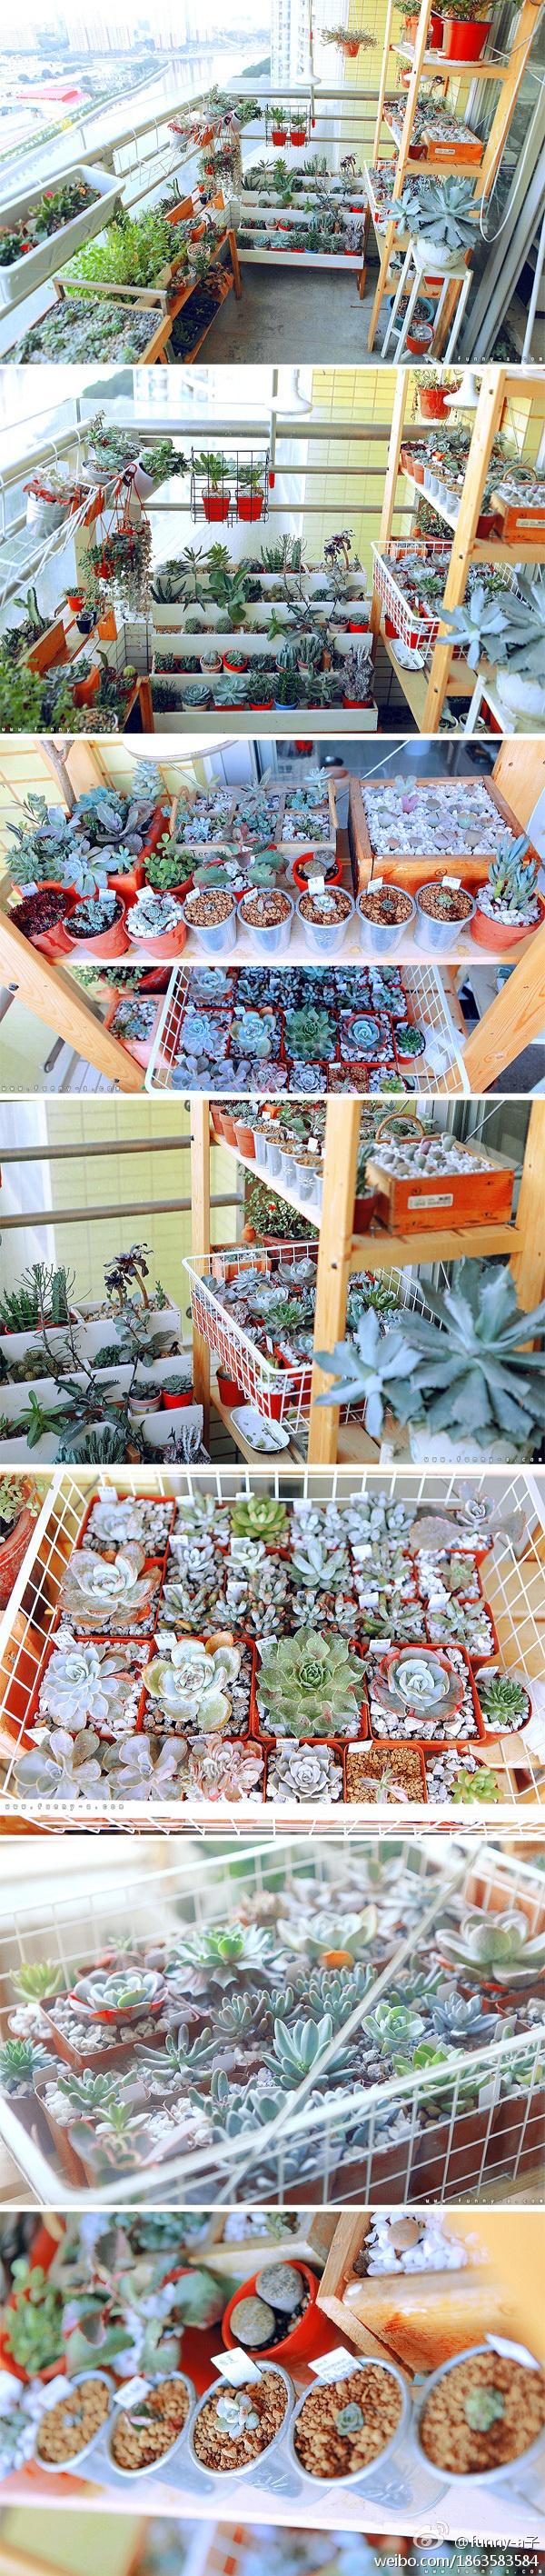 Balcony full of succulents!